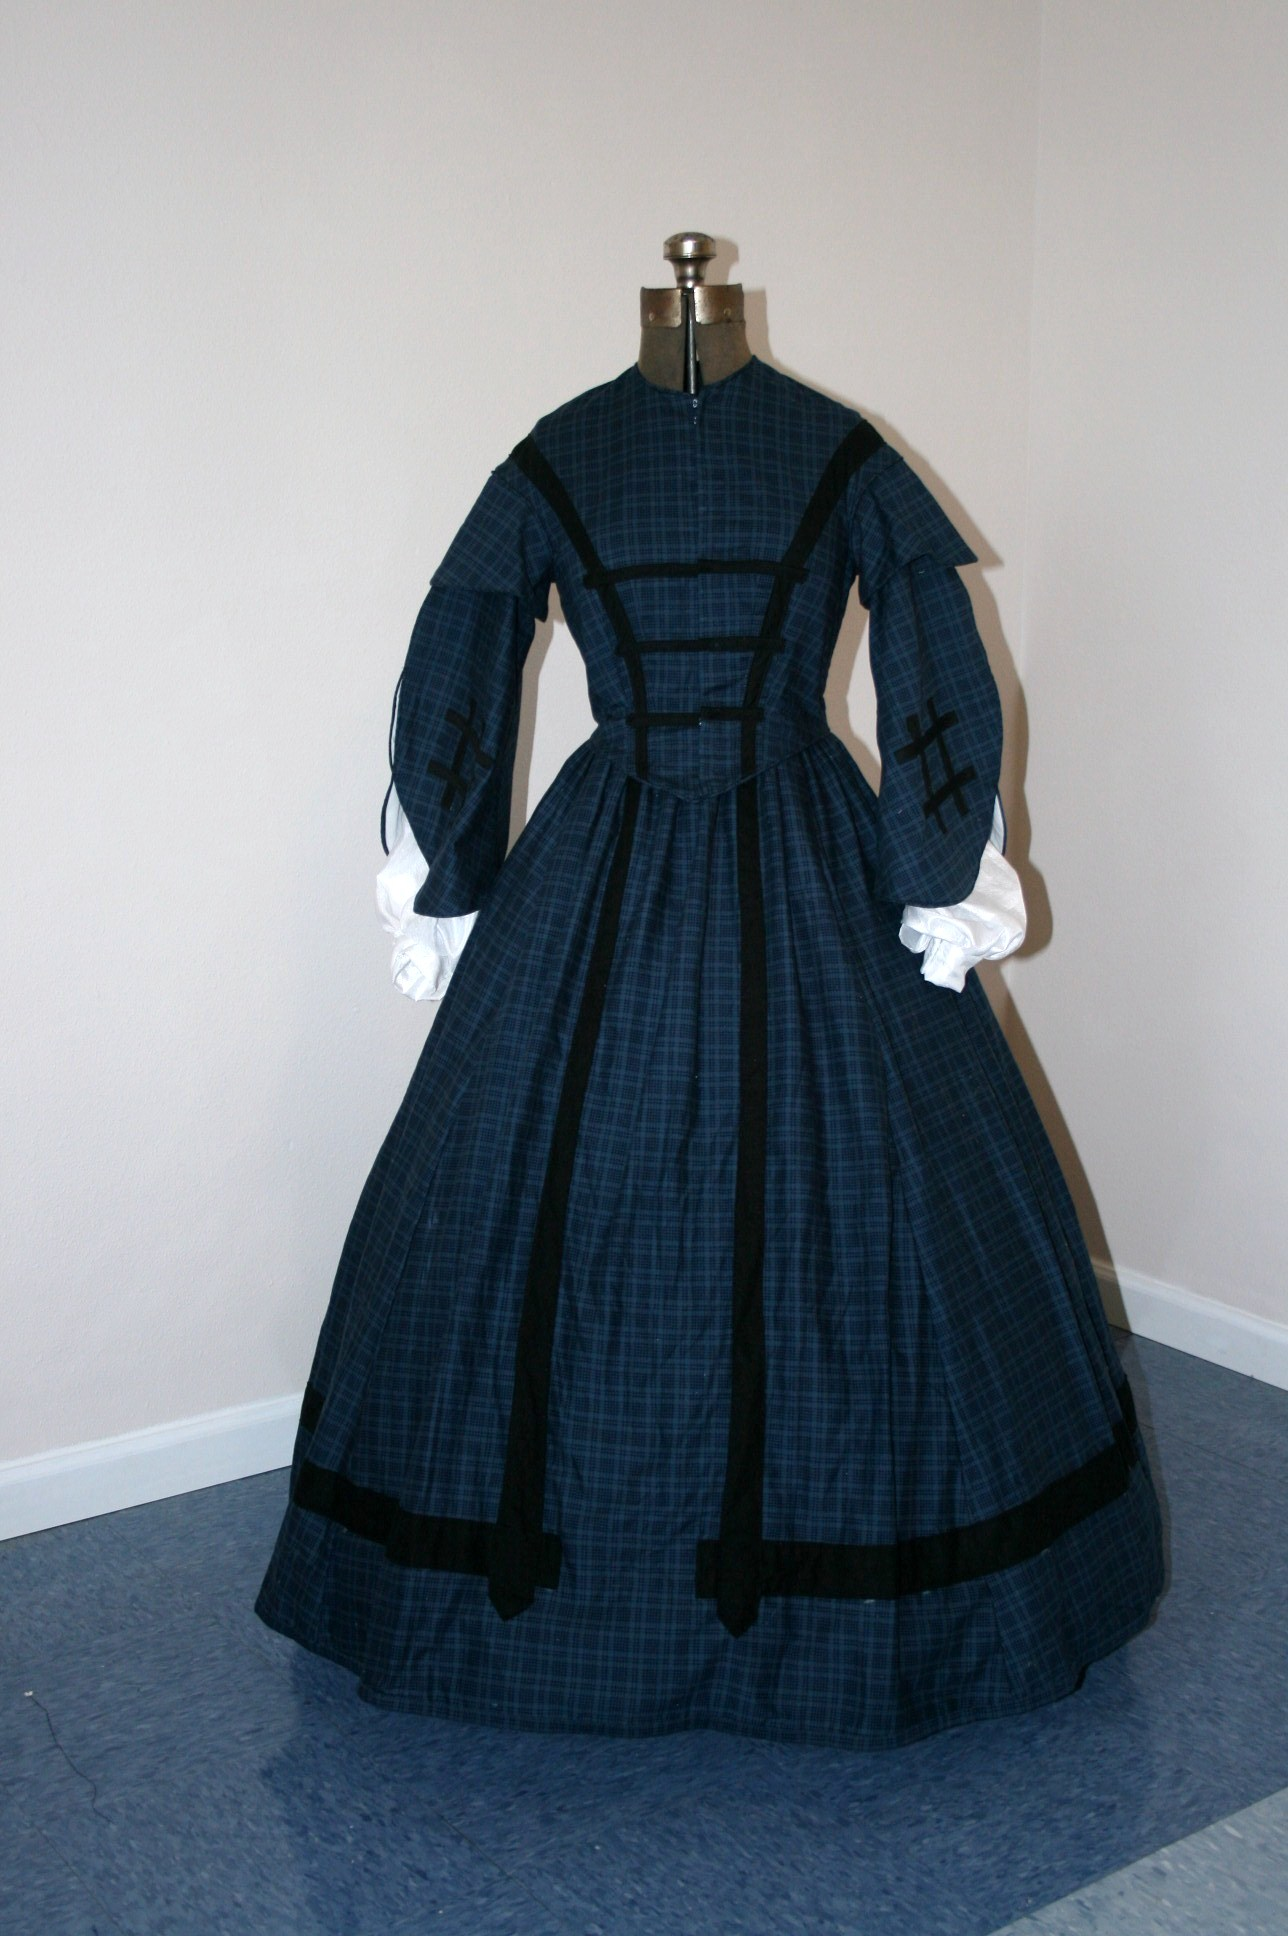 s dresses civil war fashions dresses